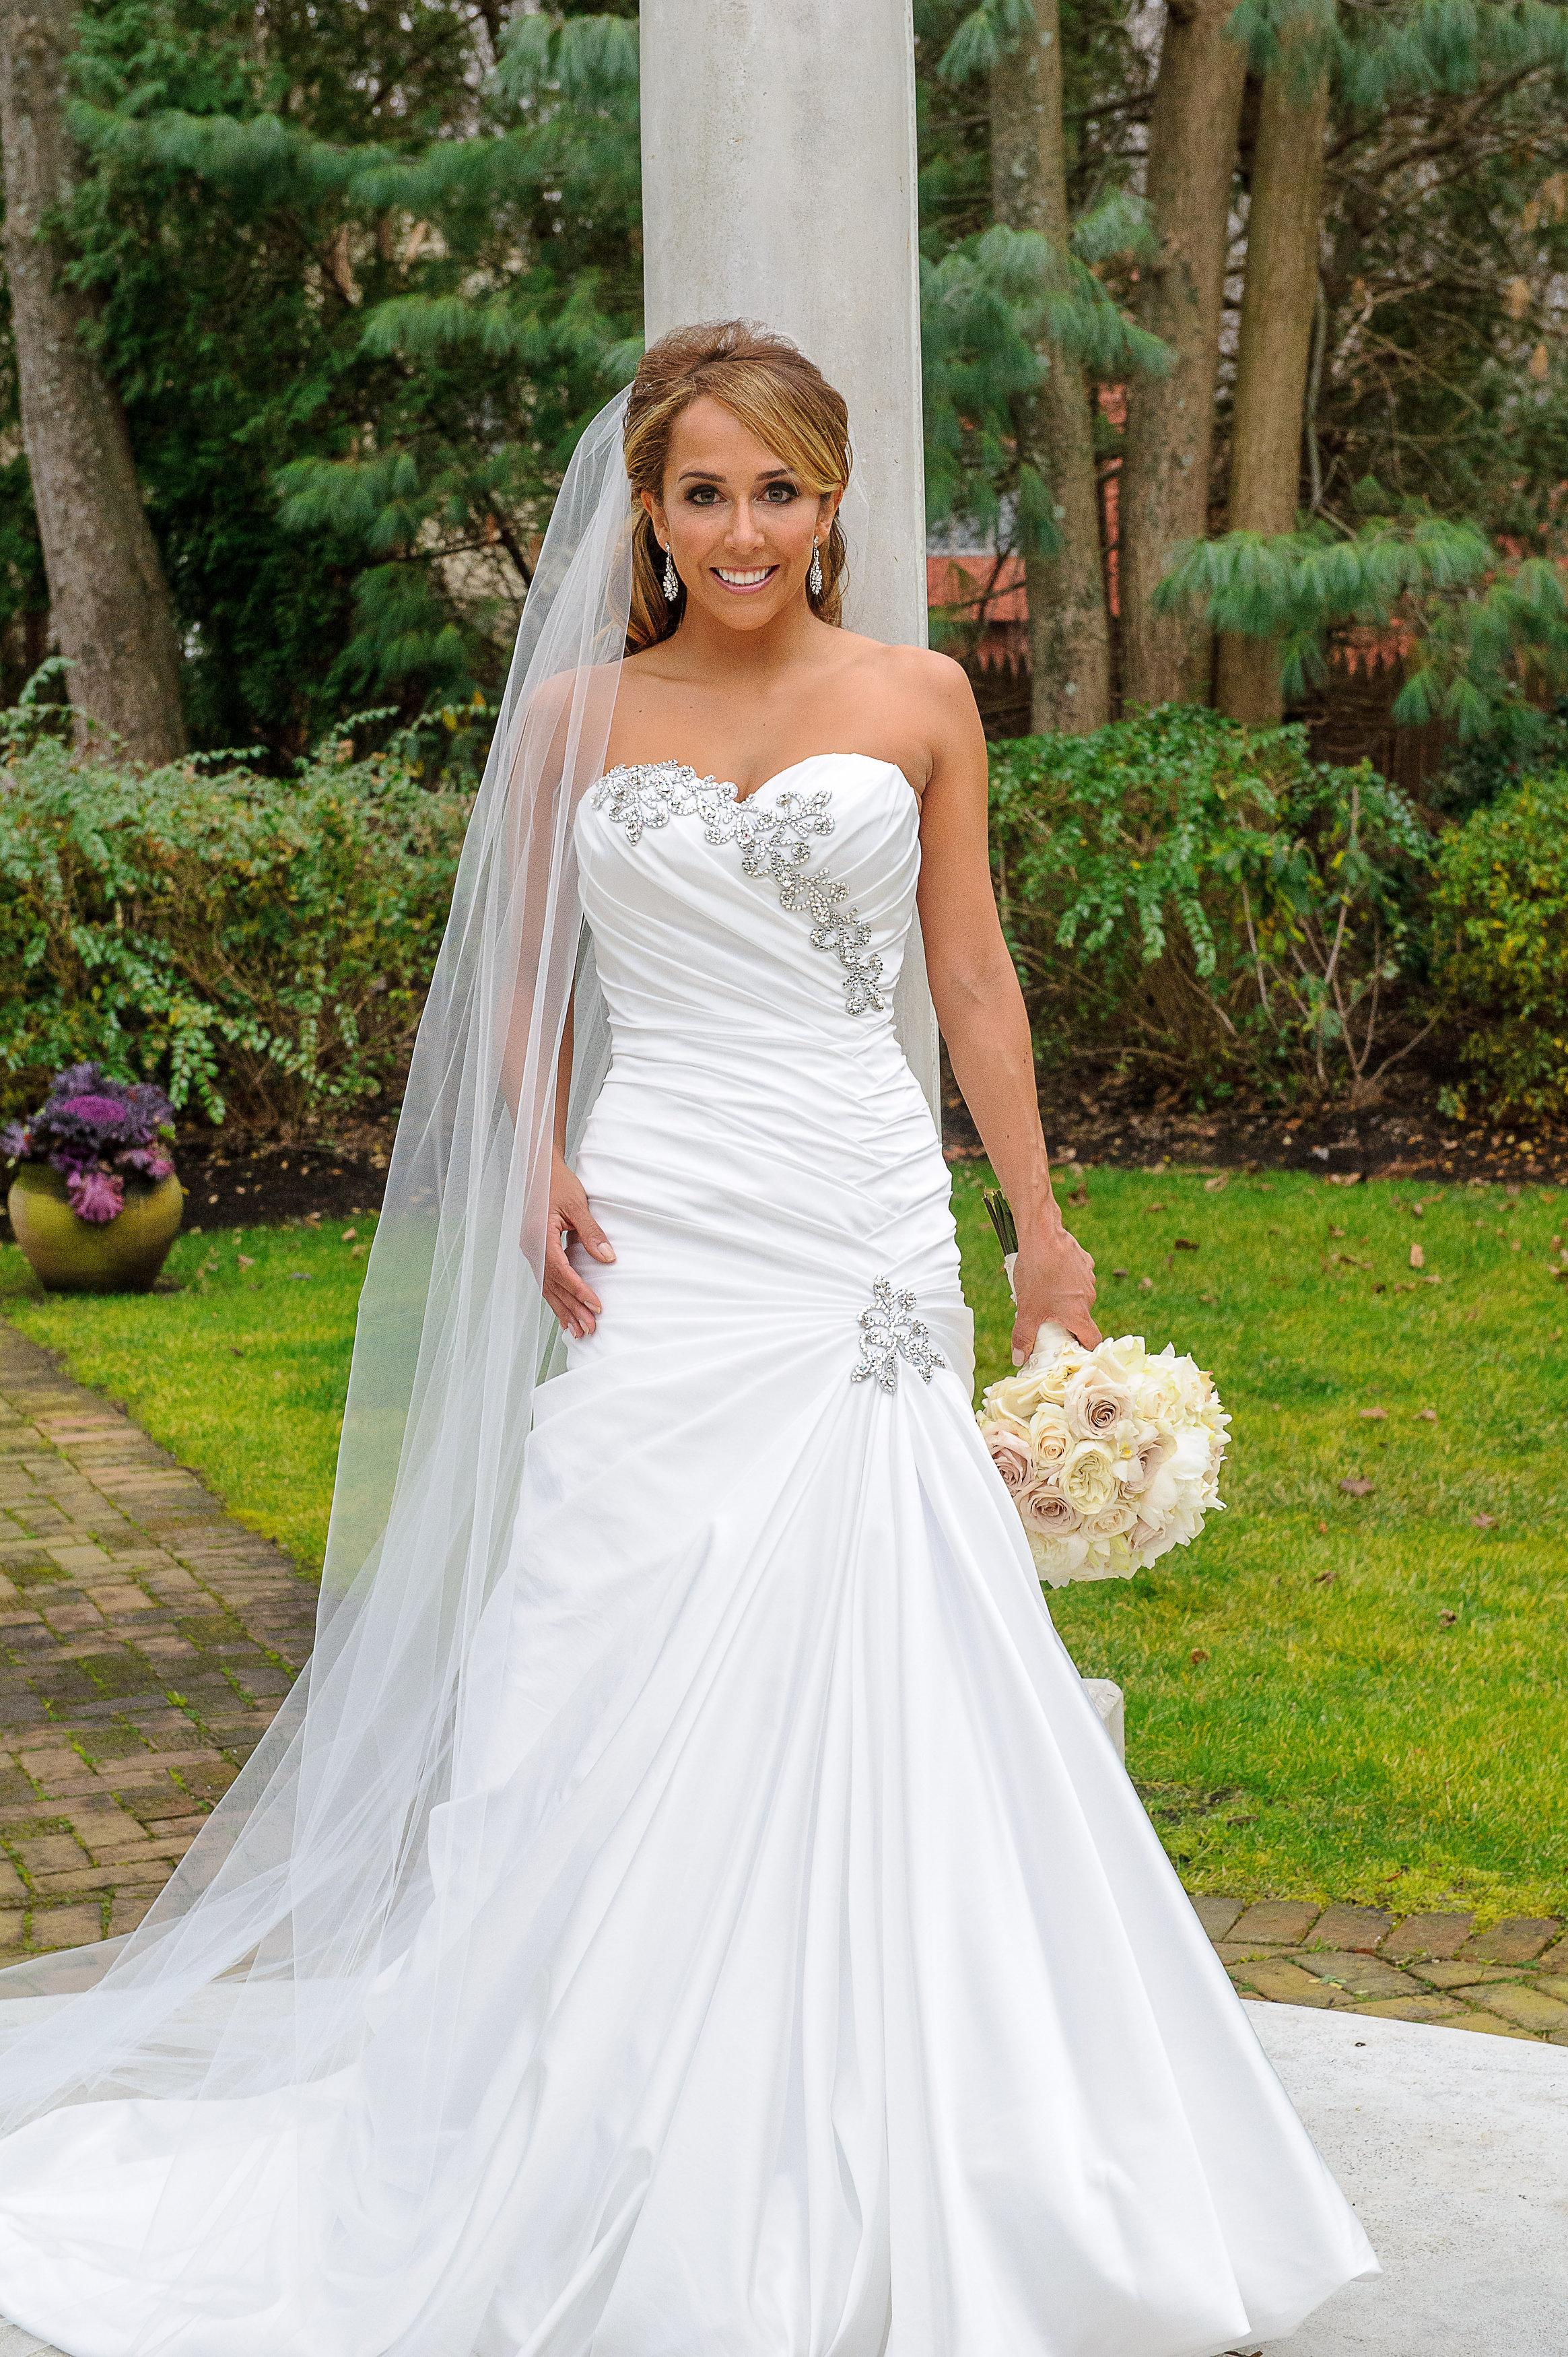 Ceci_New_York_Custom_Invitation_ New_Jersey_Wedding_Luxury_Personalized_Ceci_Style_Bride_Foil_Stamping86.JPG